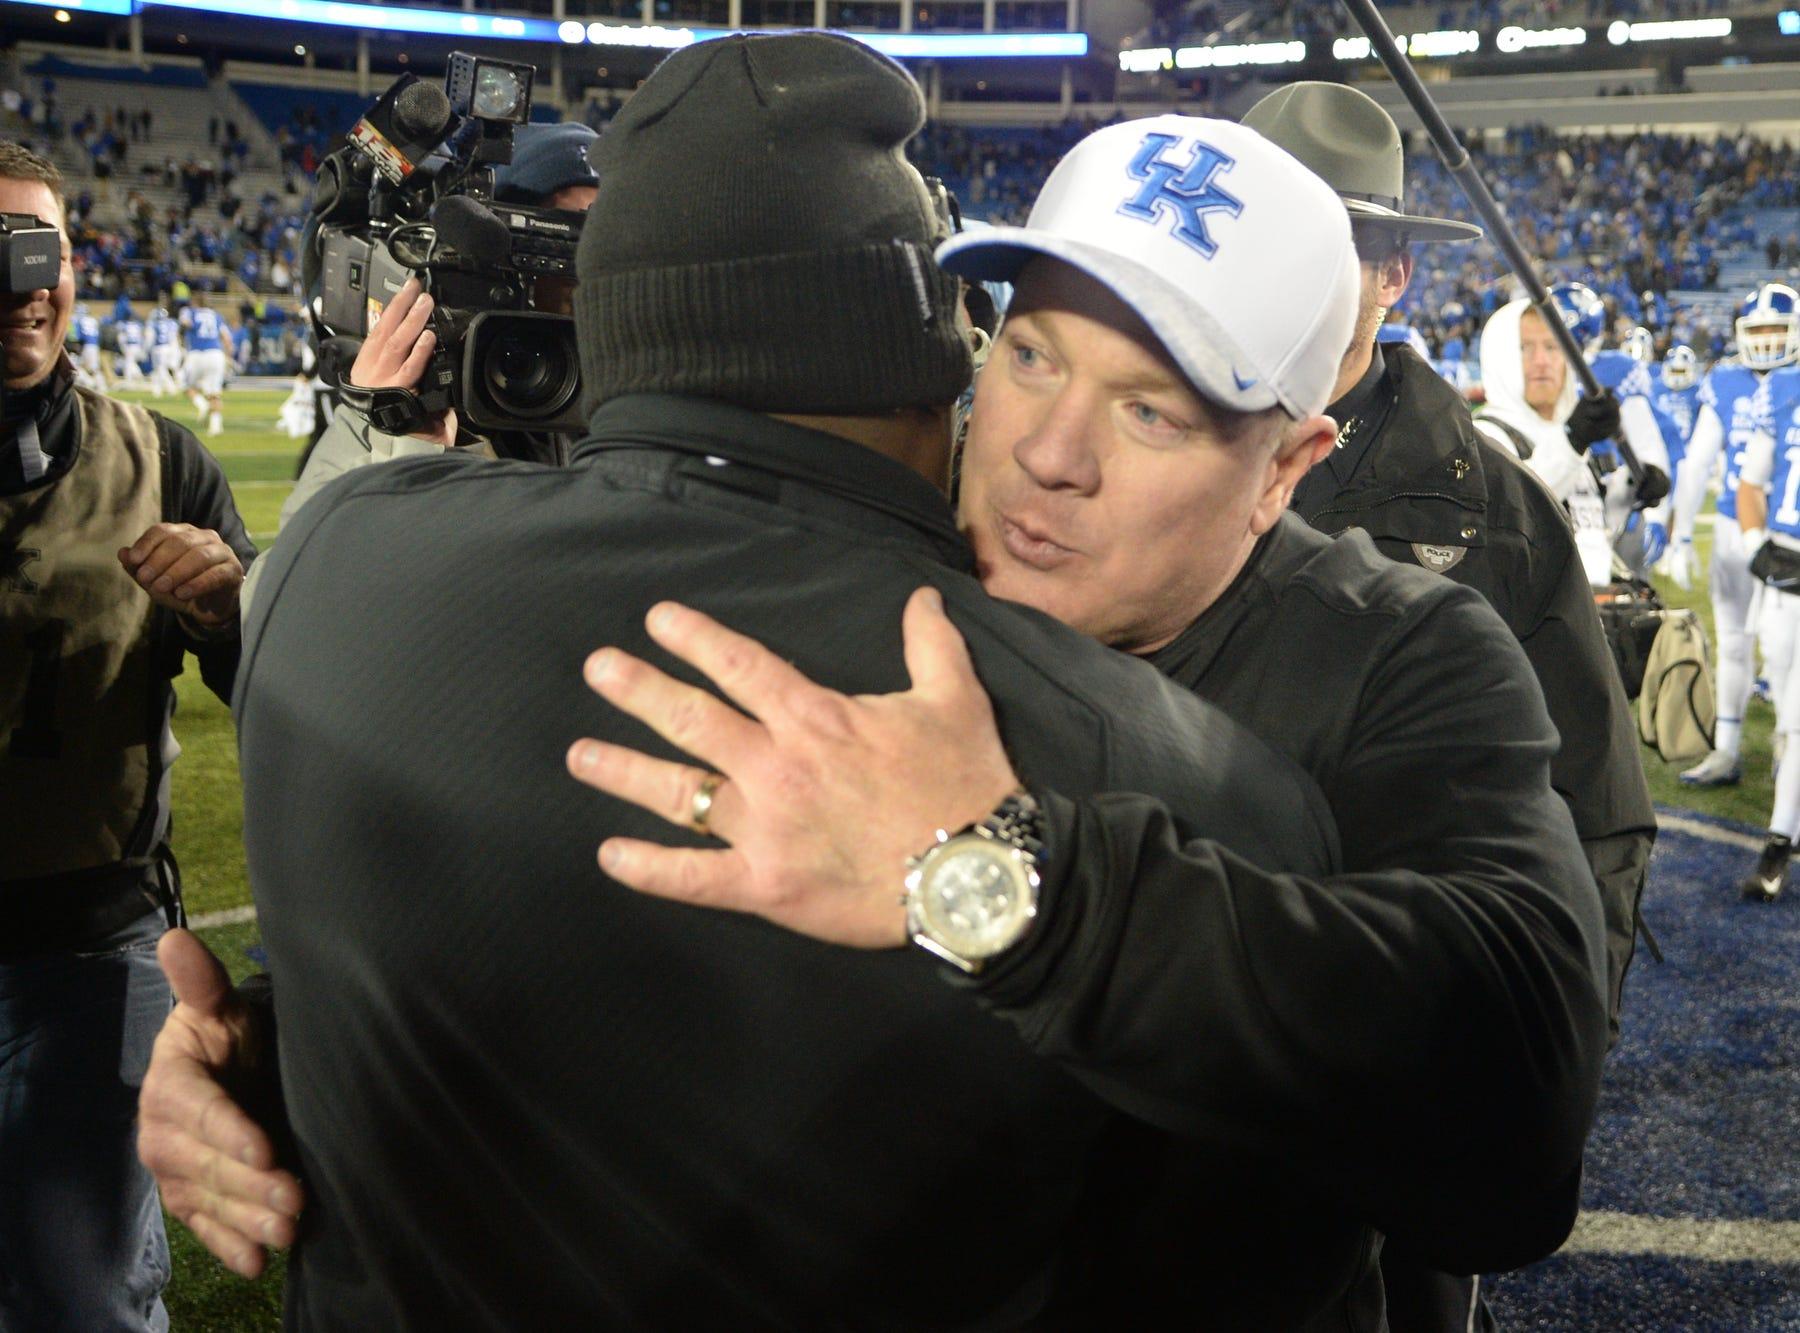 UK head coach Mark Stoops hugs Vanderbilt head coach Derek Mason after the University of Kentucky football game against Vanderbilt at Kroger Field in Lexington, Kentucky on Saturday, October 20, 2018.